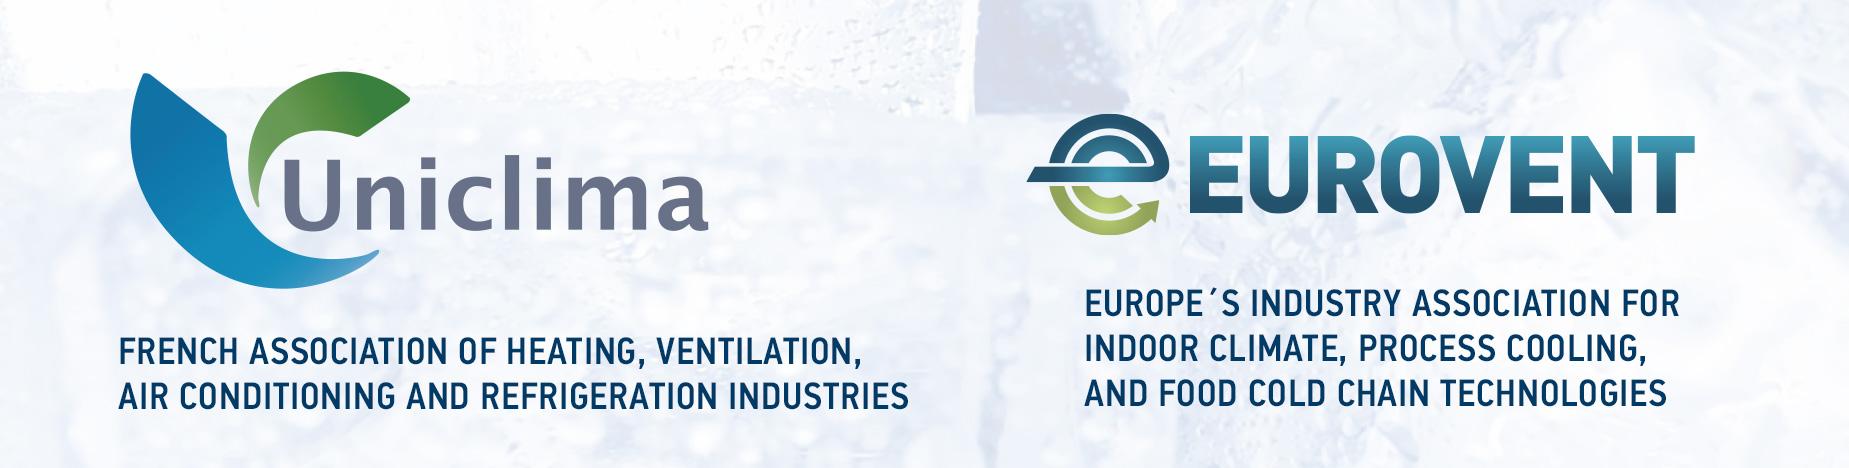 Uniclima & Eurovent